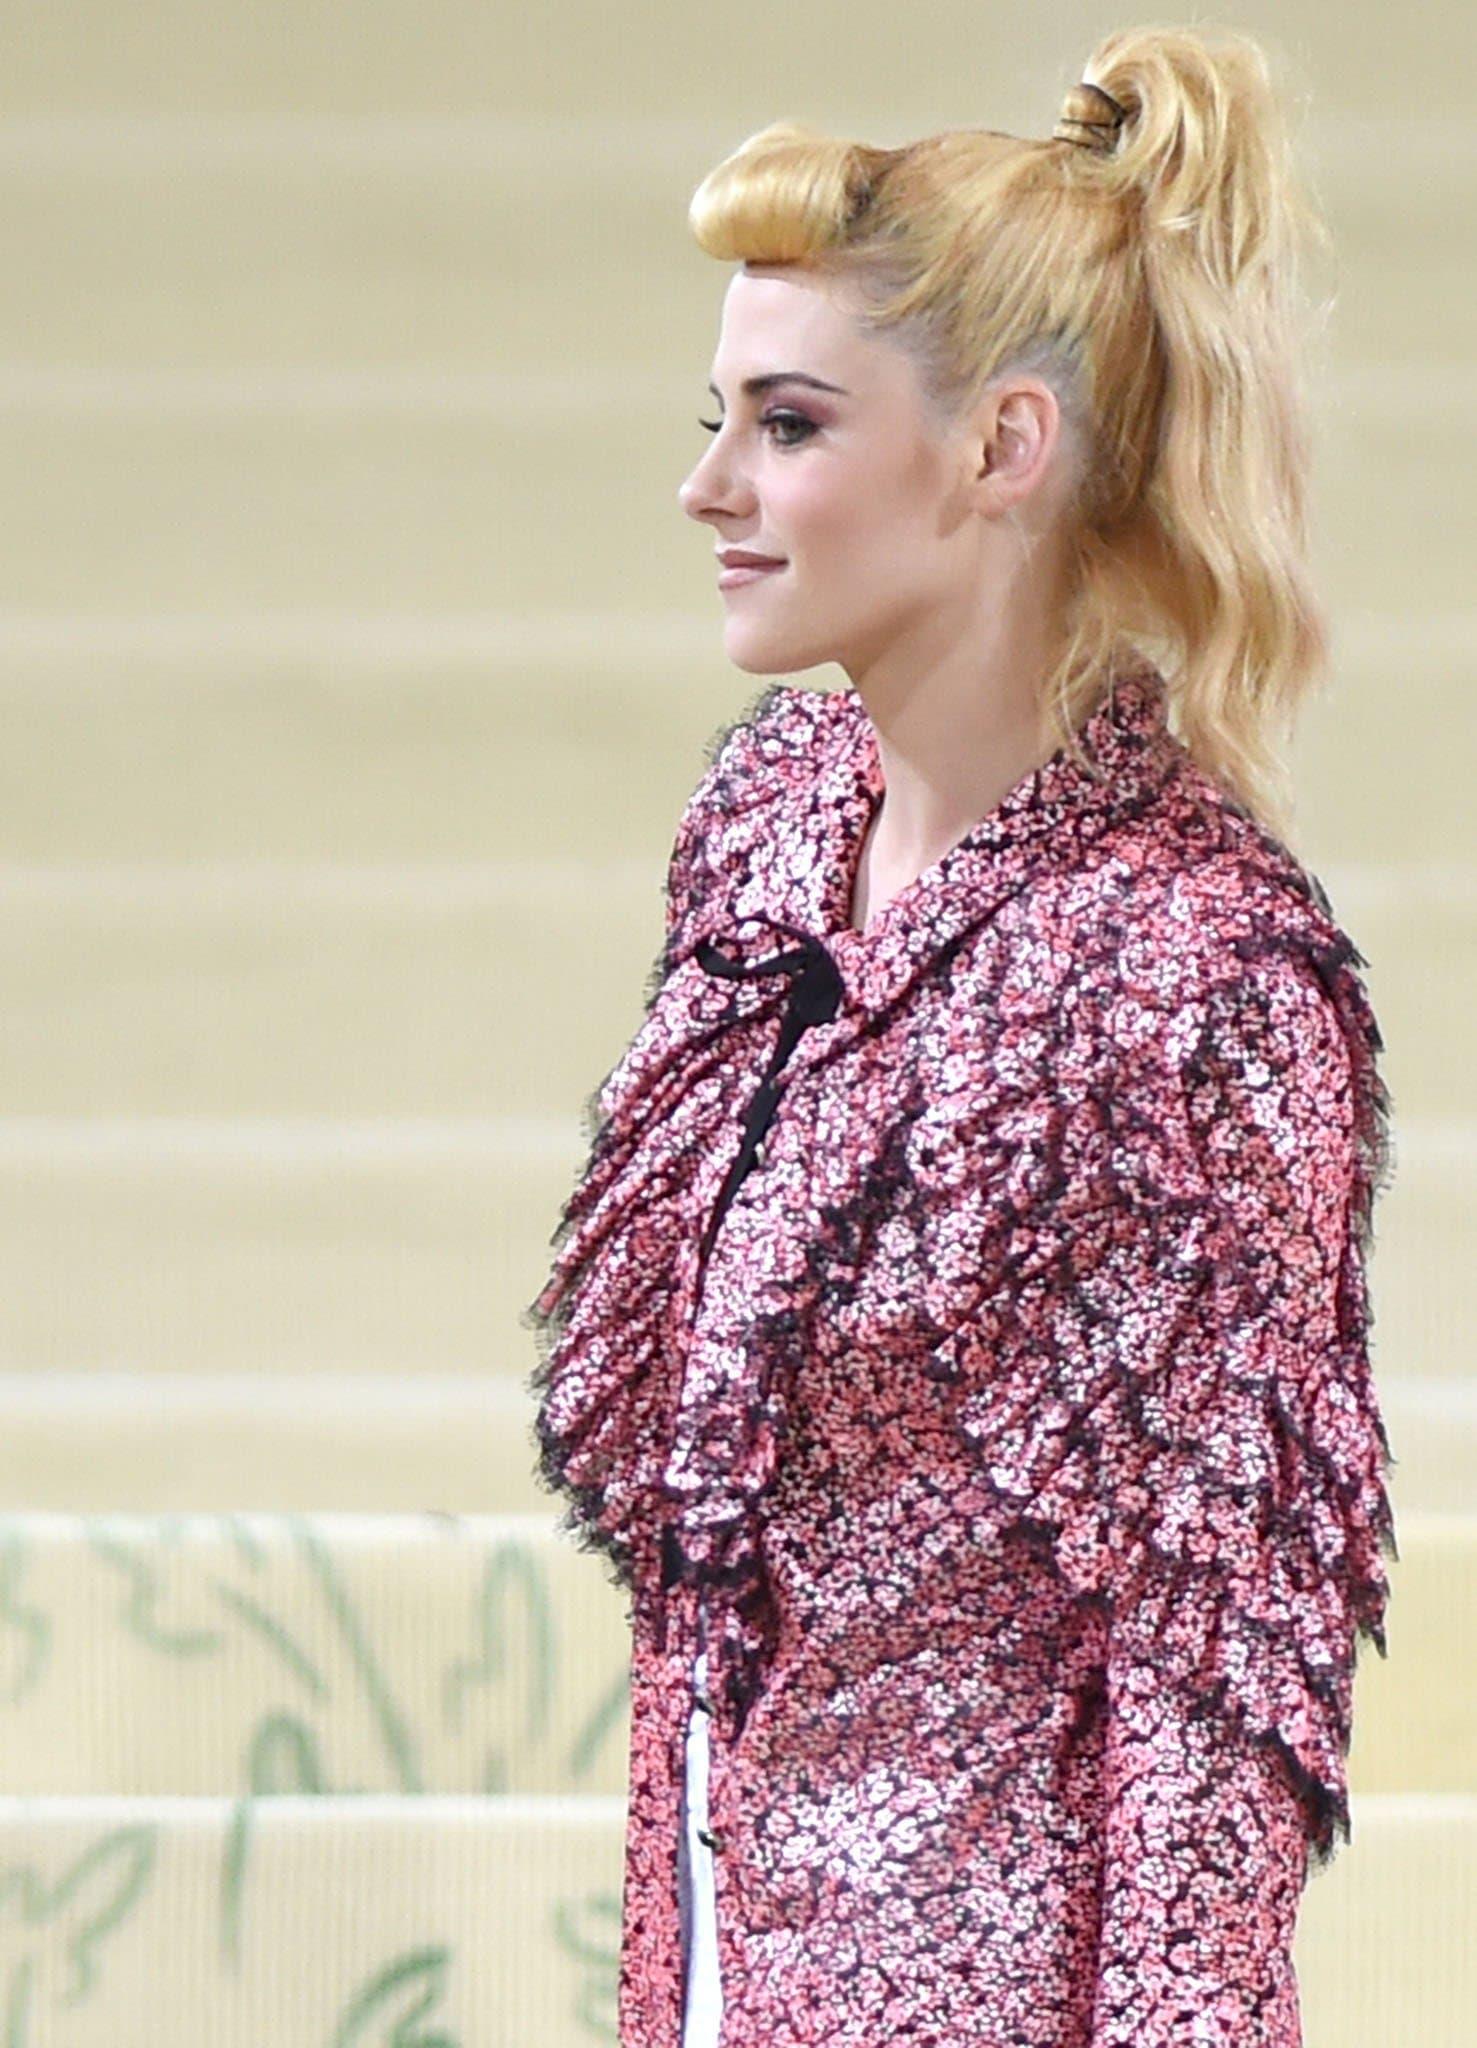 Chanel muse Kristen Stewart attends the 2021 Met Gala in head-to-toe Chanel